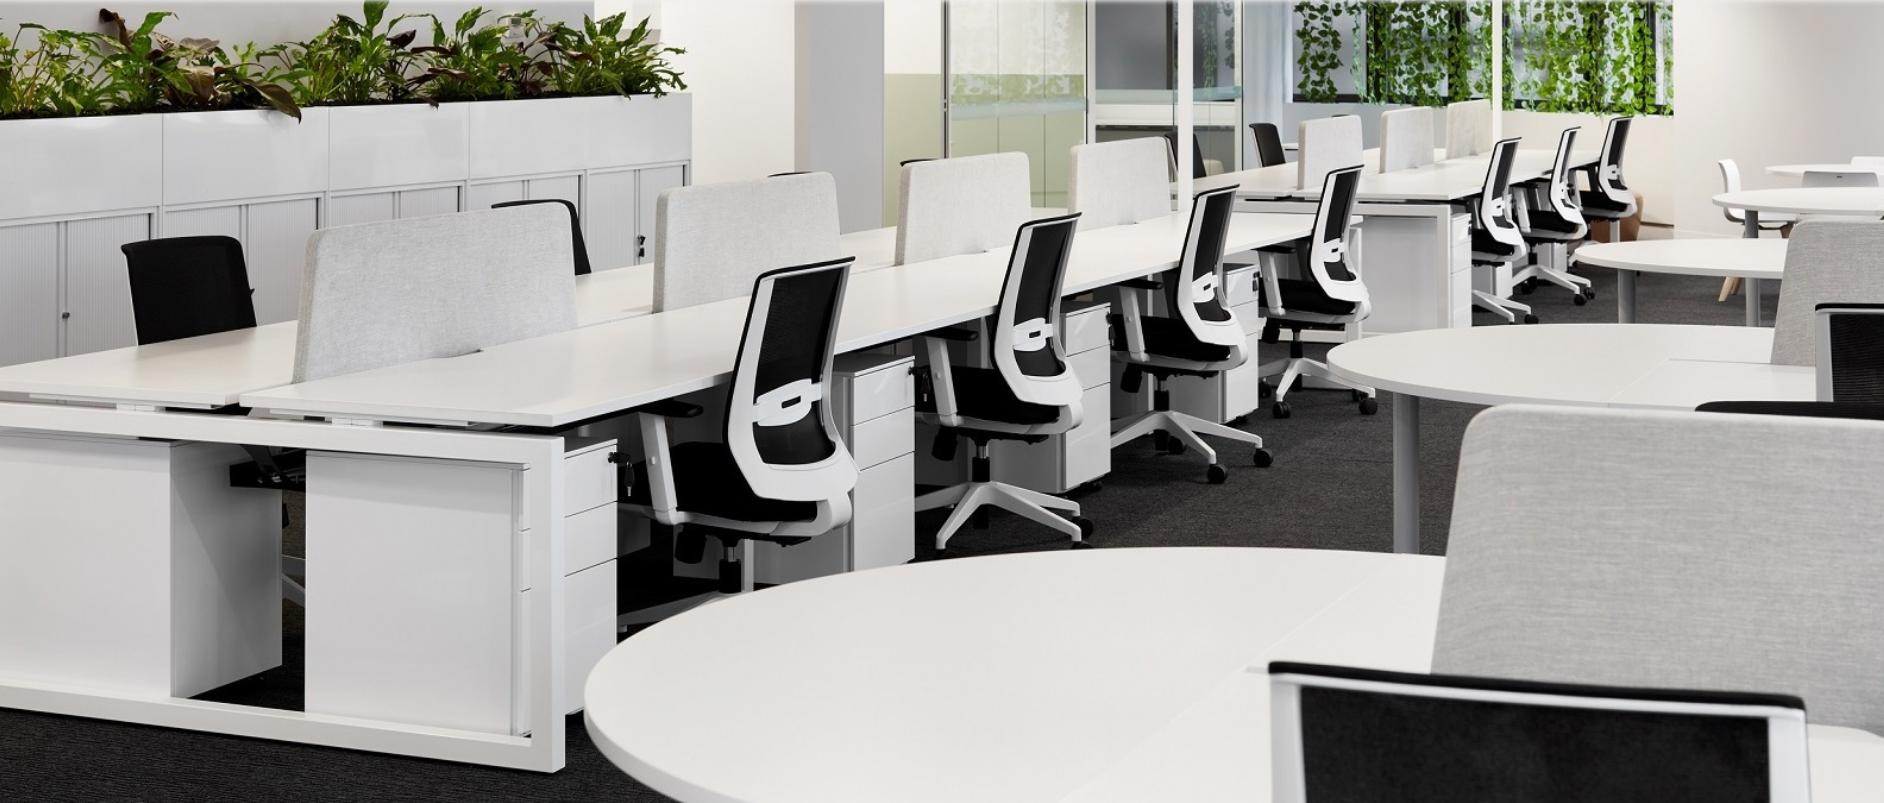 Loop Desk Cluster With Acoustic Screens